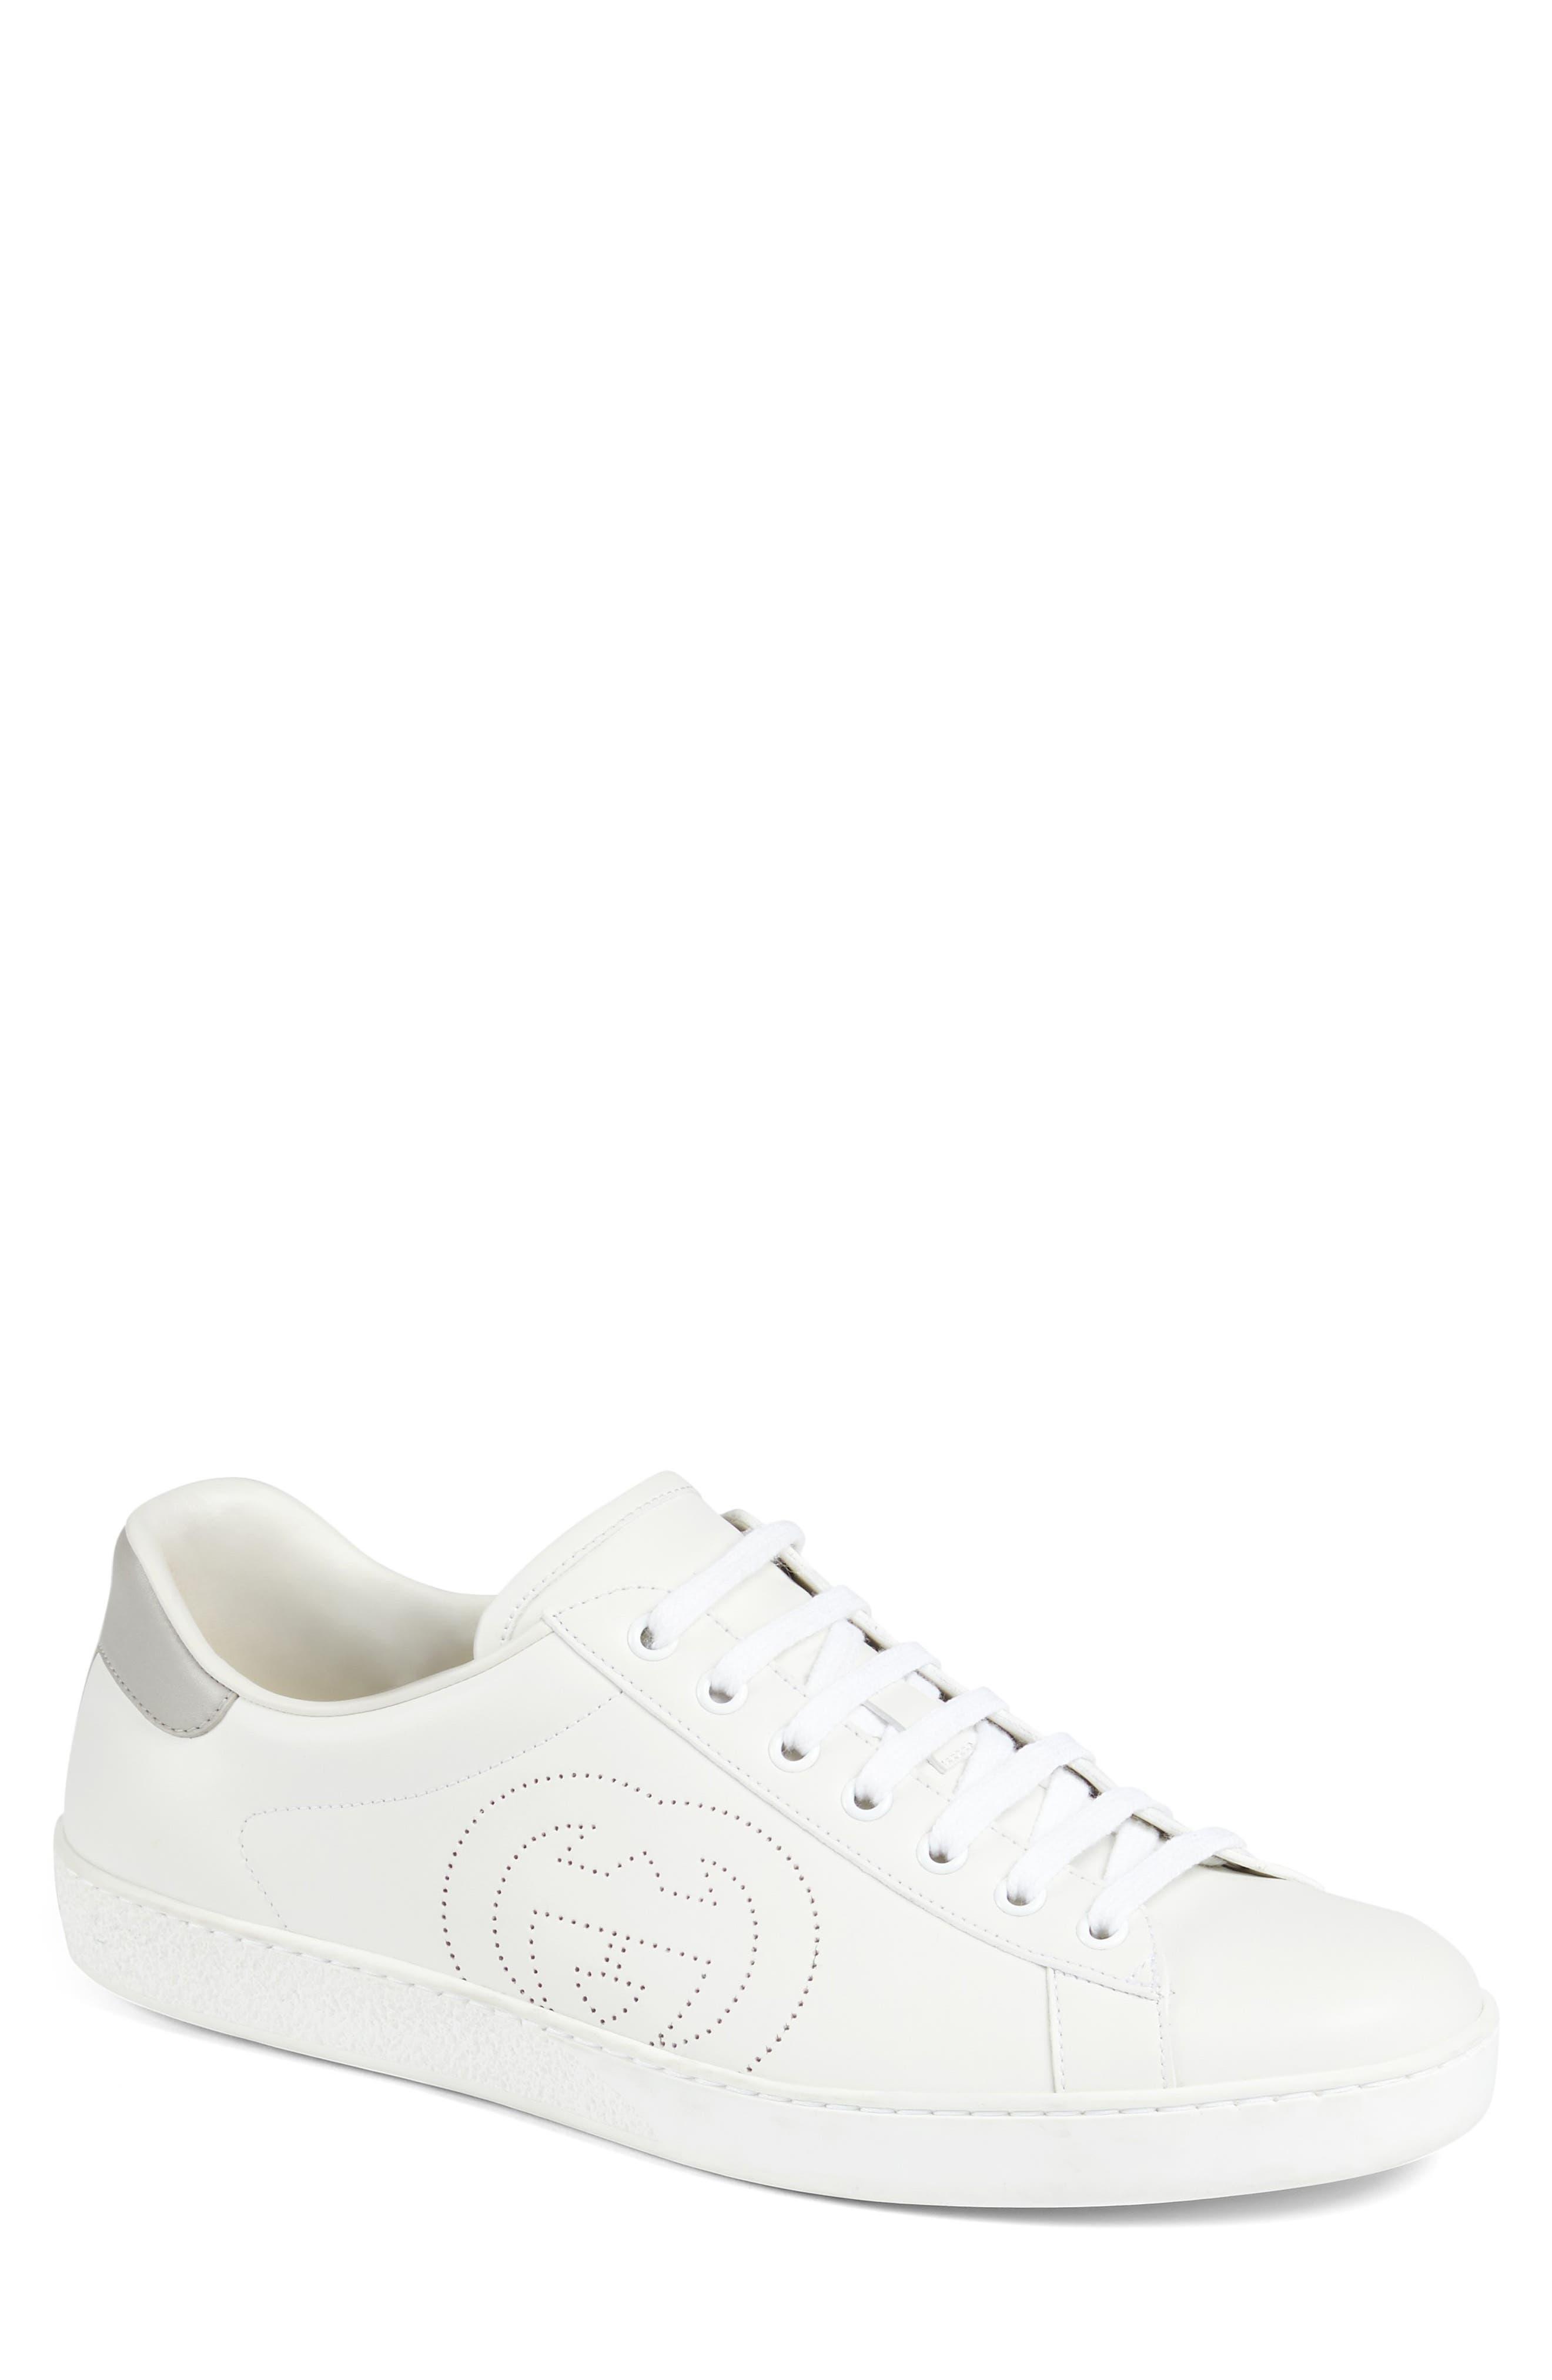 Men's Gucci Shoes | Nordstrom